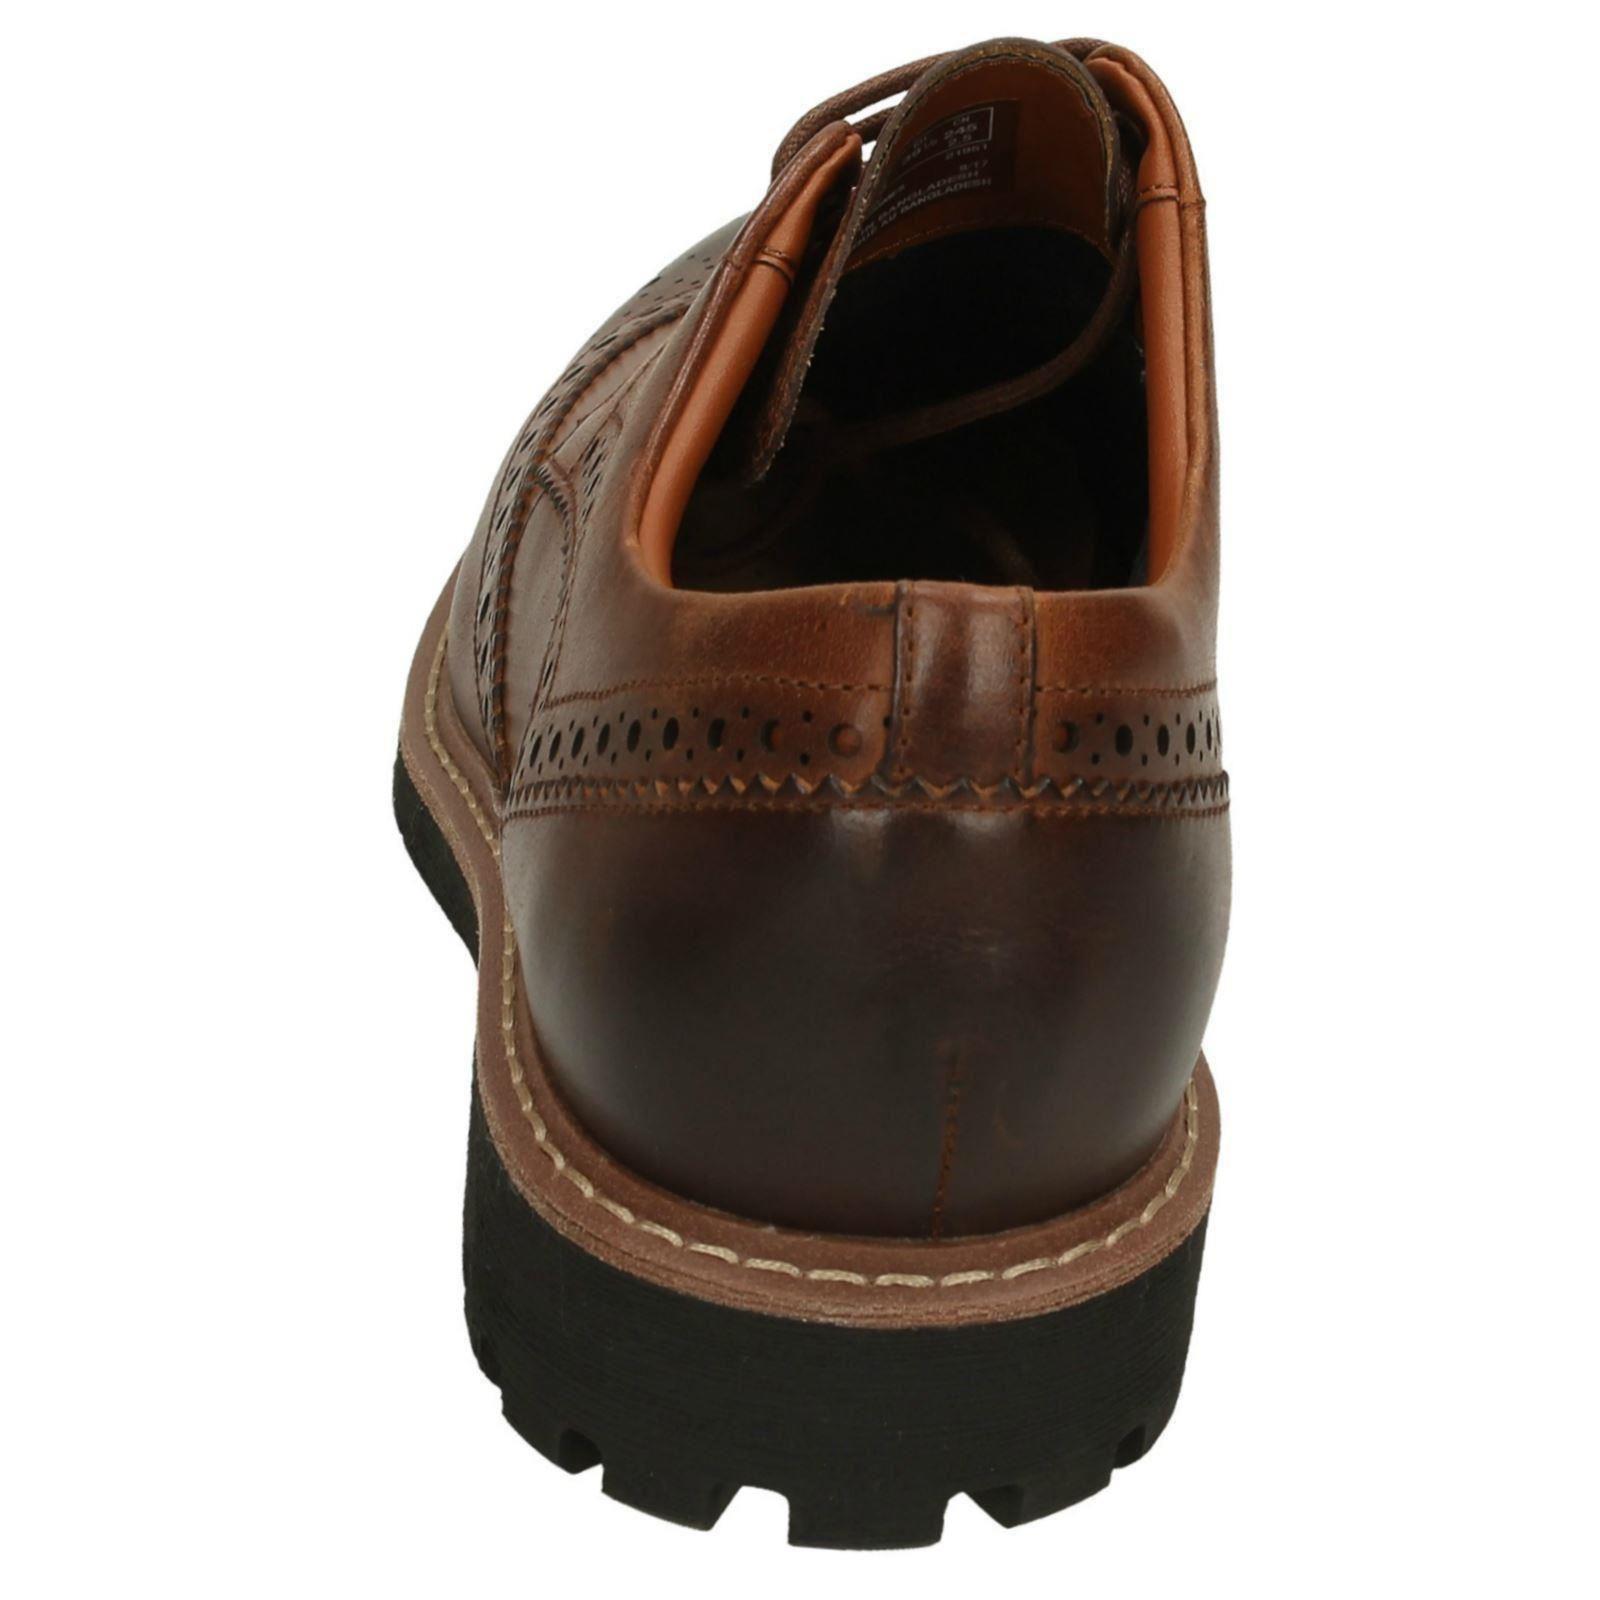 Hommes Clarks Habillé Habillé Clarks Chaussures Richelieu' Batcombe Aile ' f74588